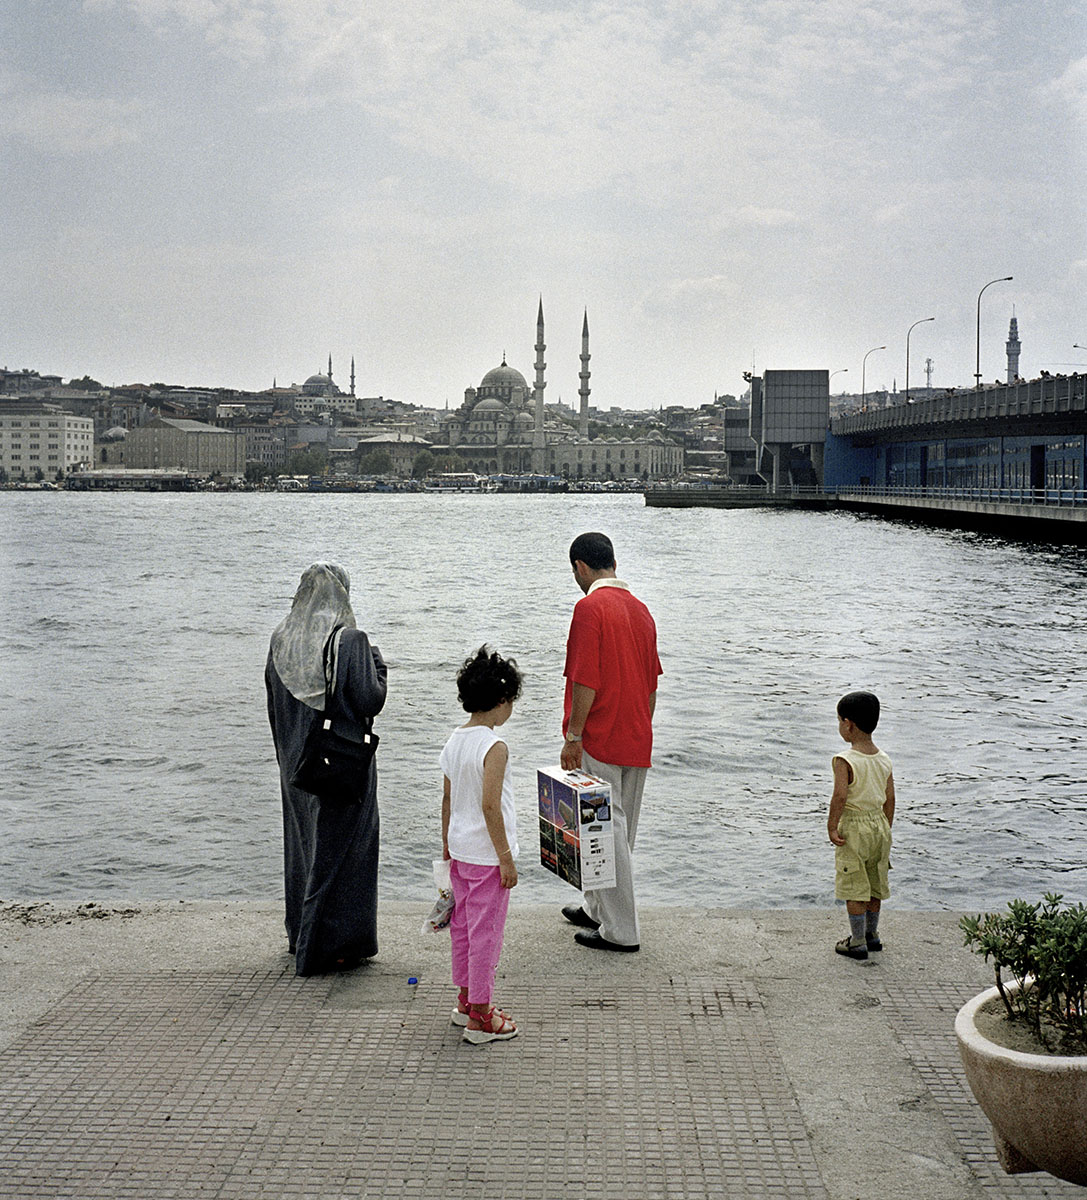 Miska_Draskoczy_Turkish_Family.jpg